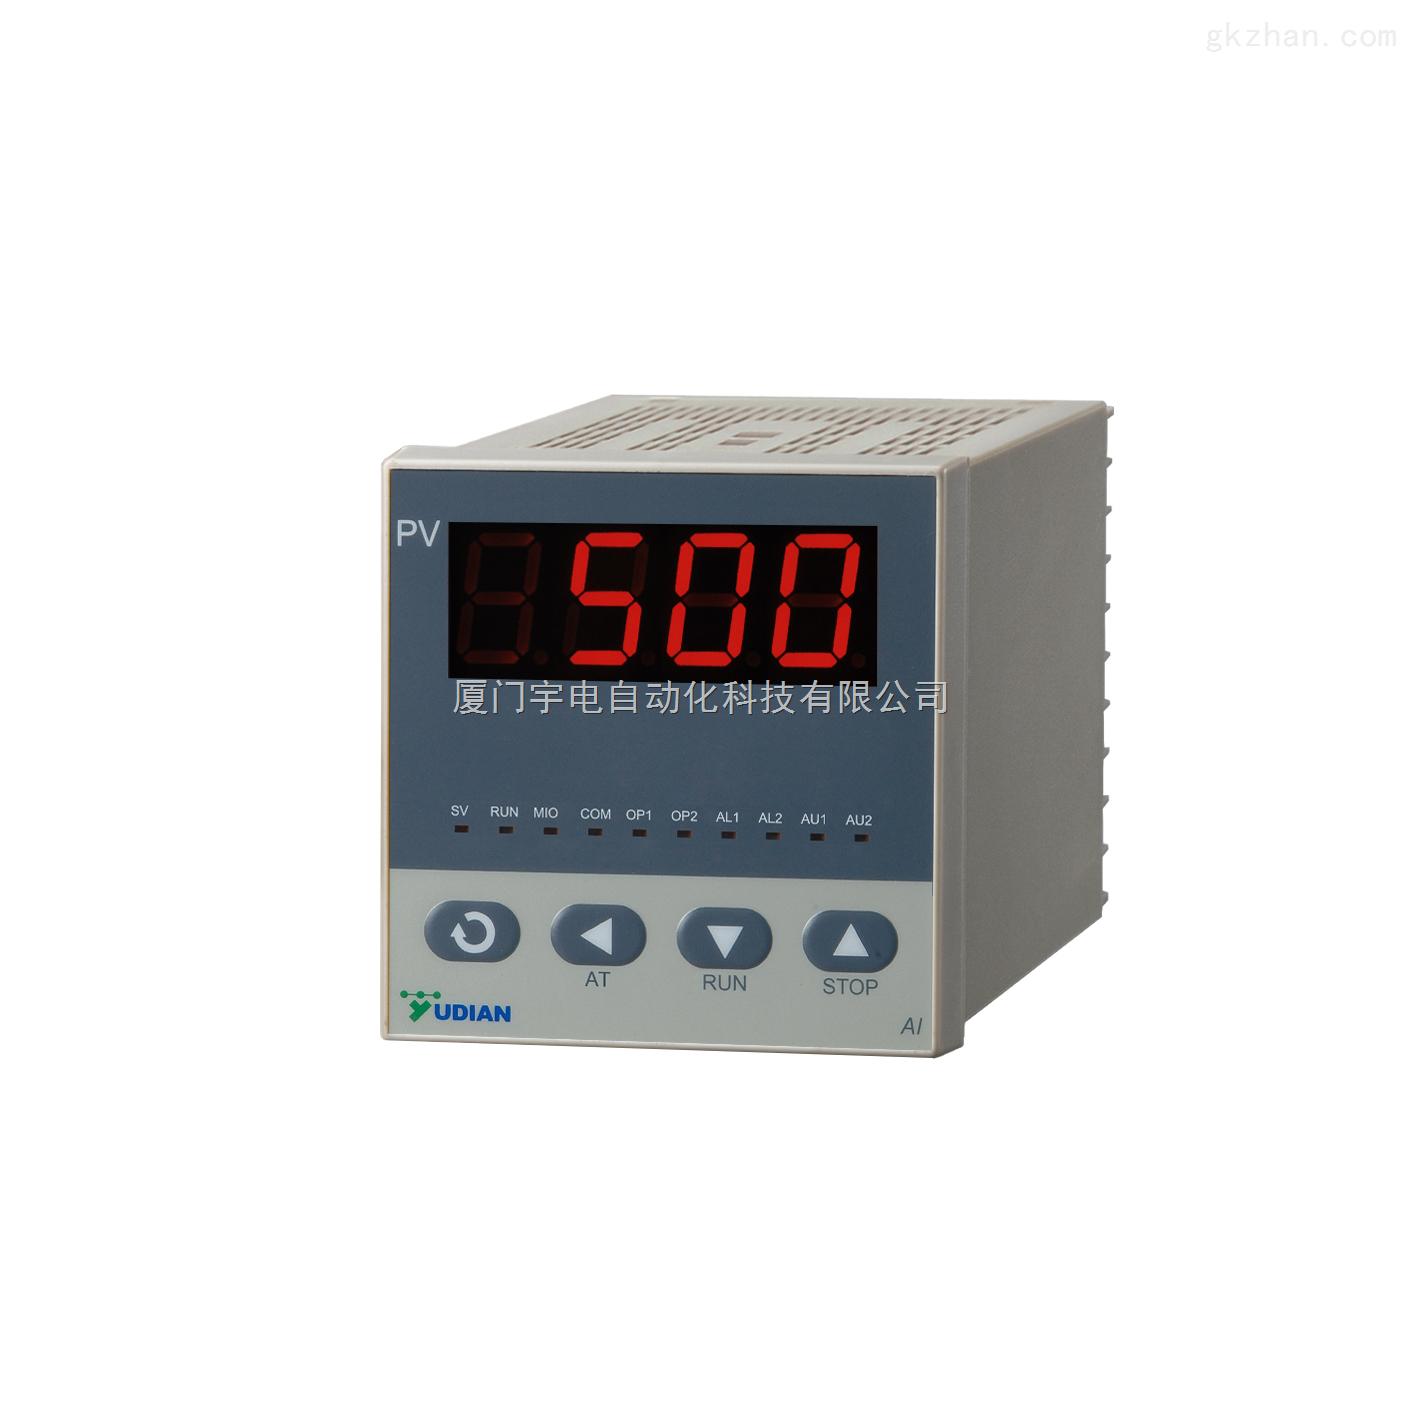 lm339单路led电平指示电路图